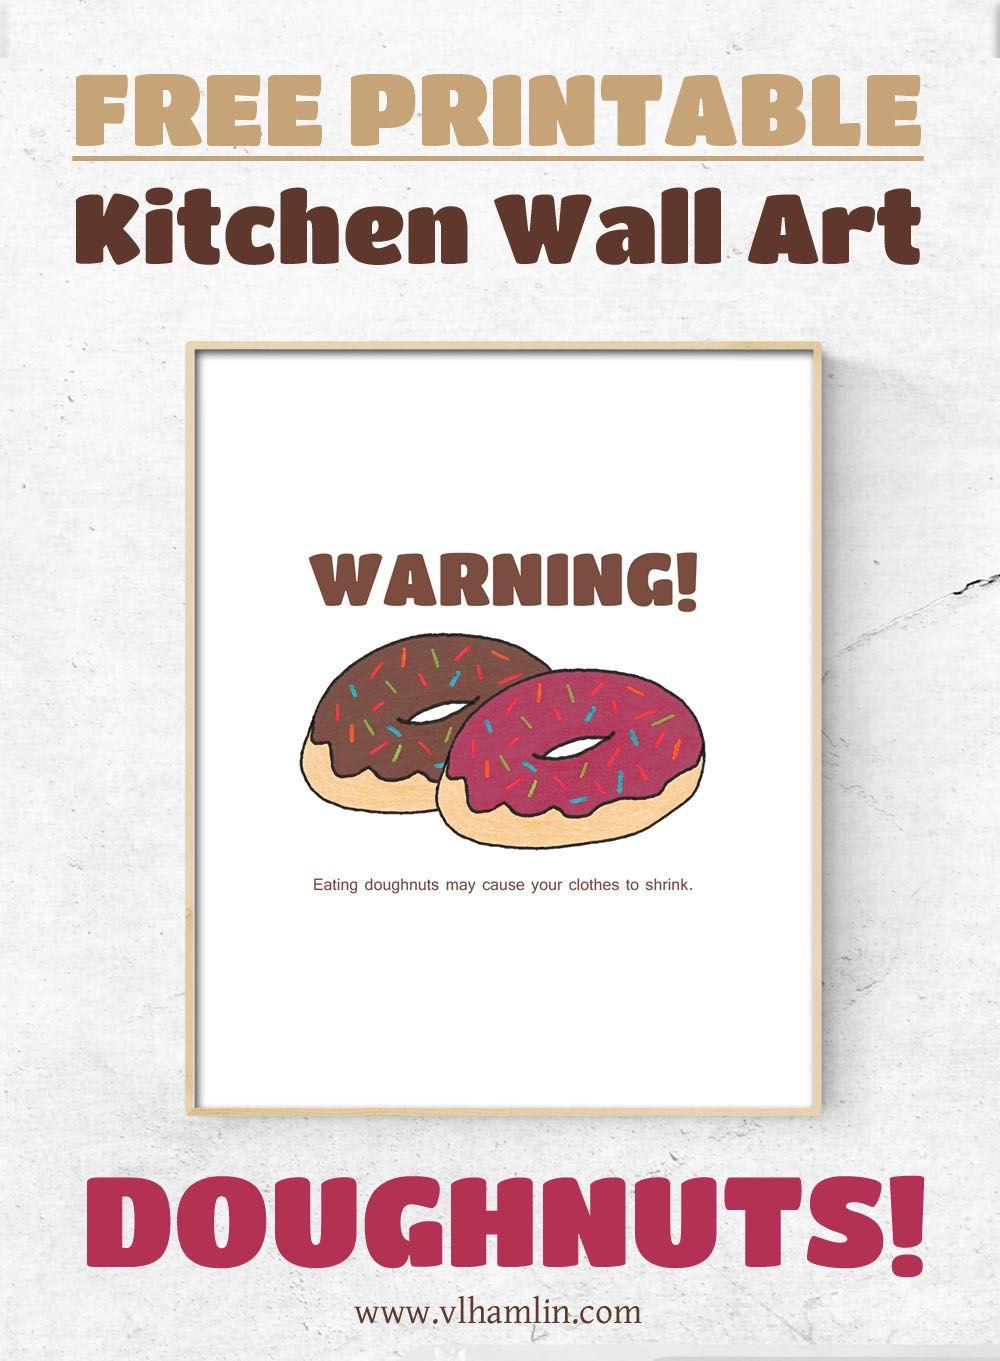 Free printable kitchen wall art doughnuts kitchen wall art and